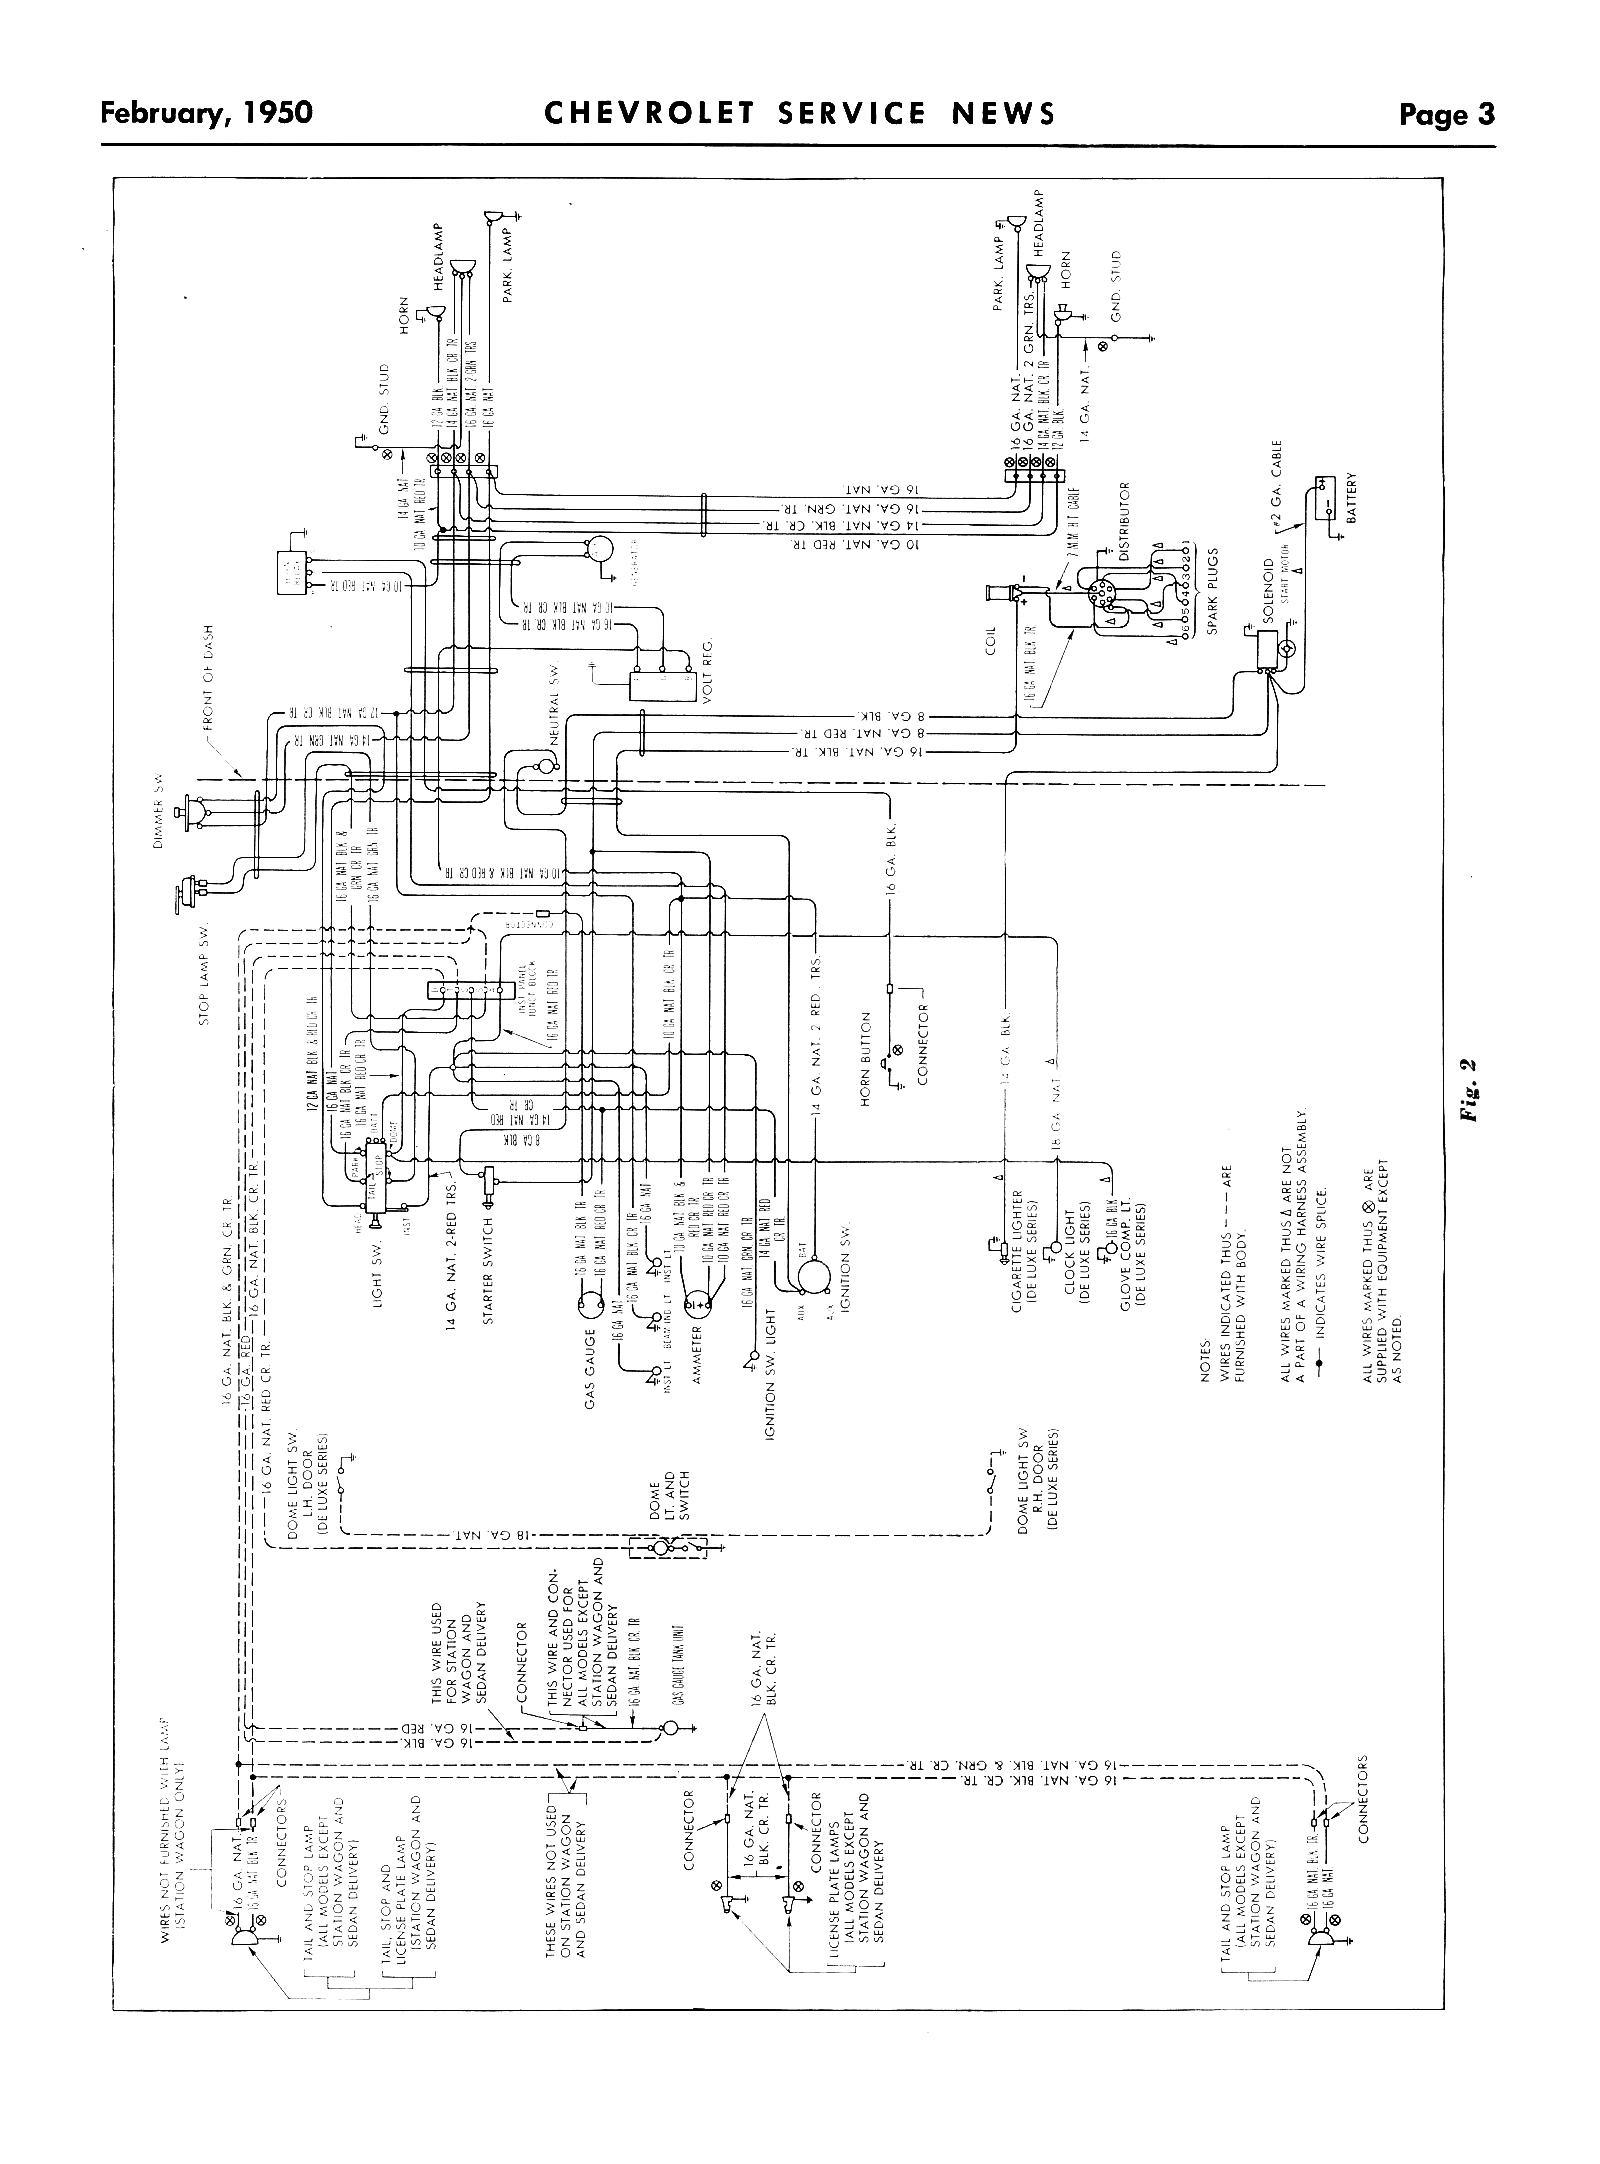 1950 chevy truck headlight switch wiring